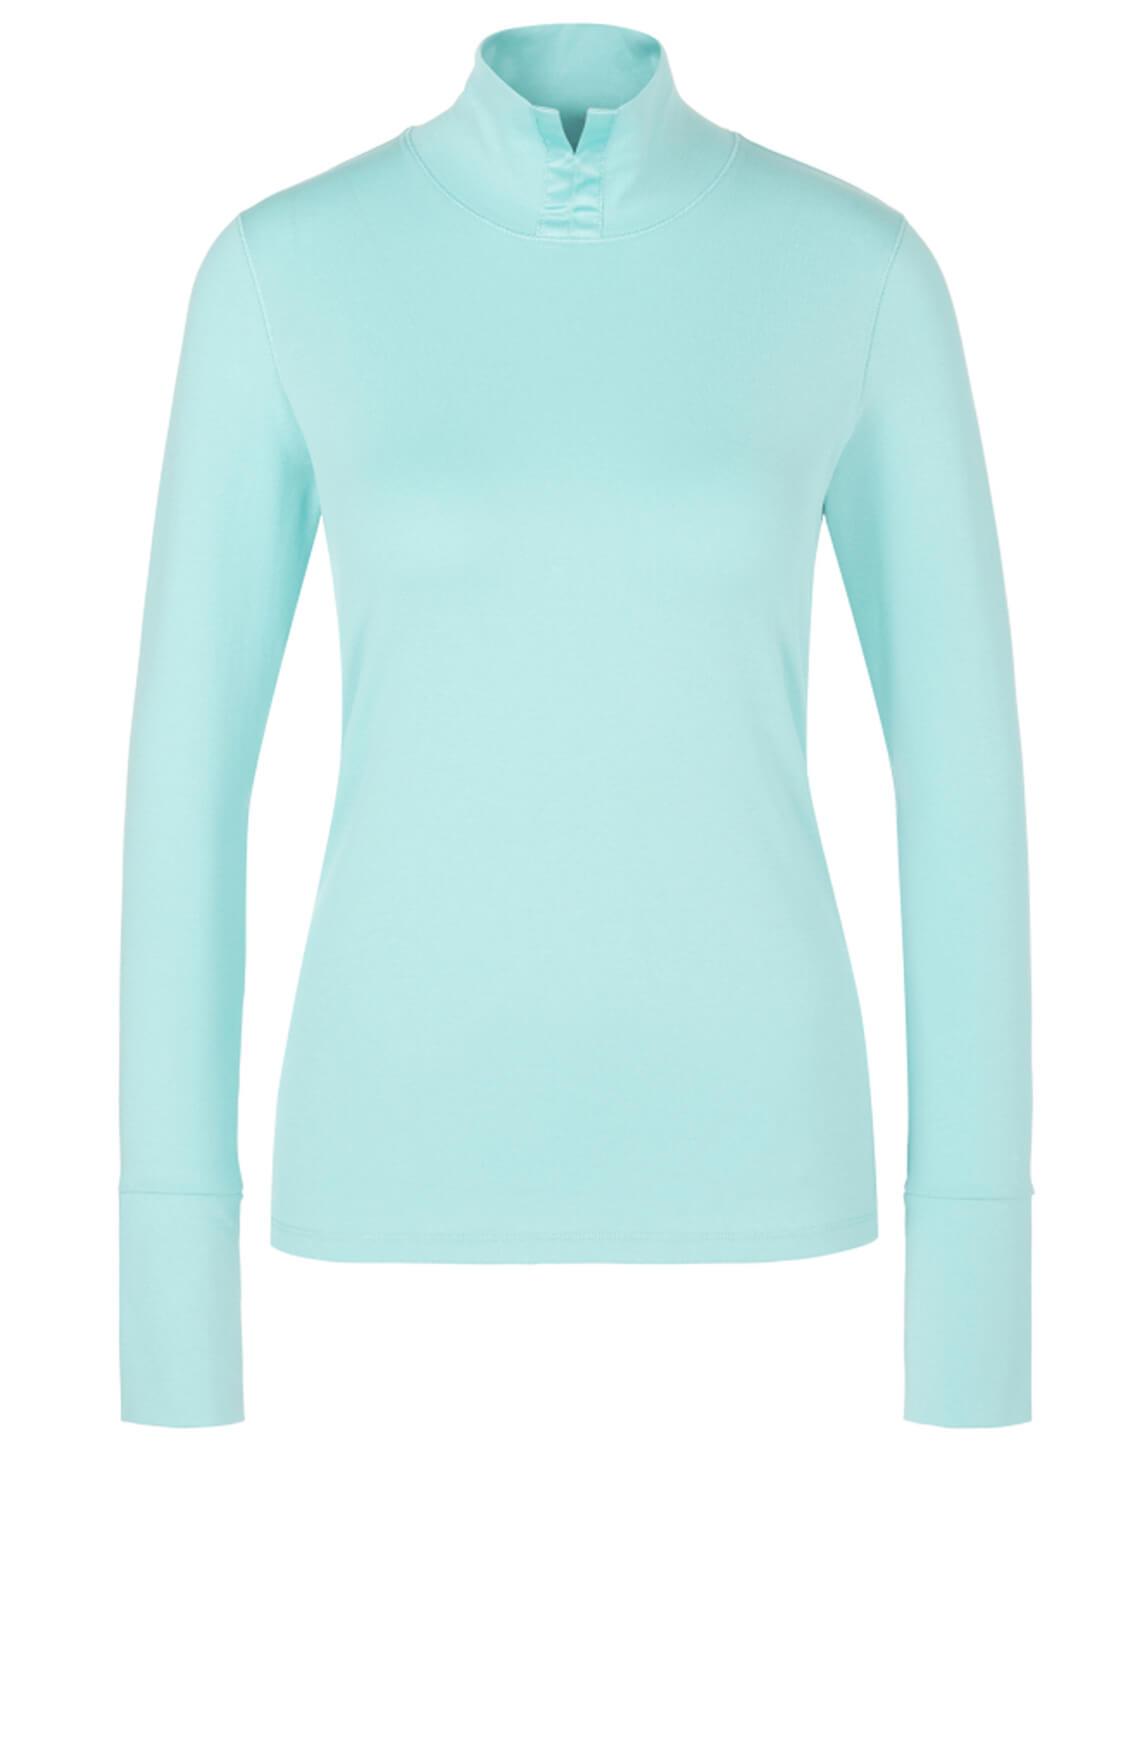 Marccain Dames Shirt Blauw